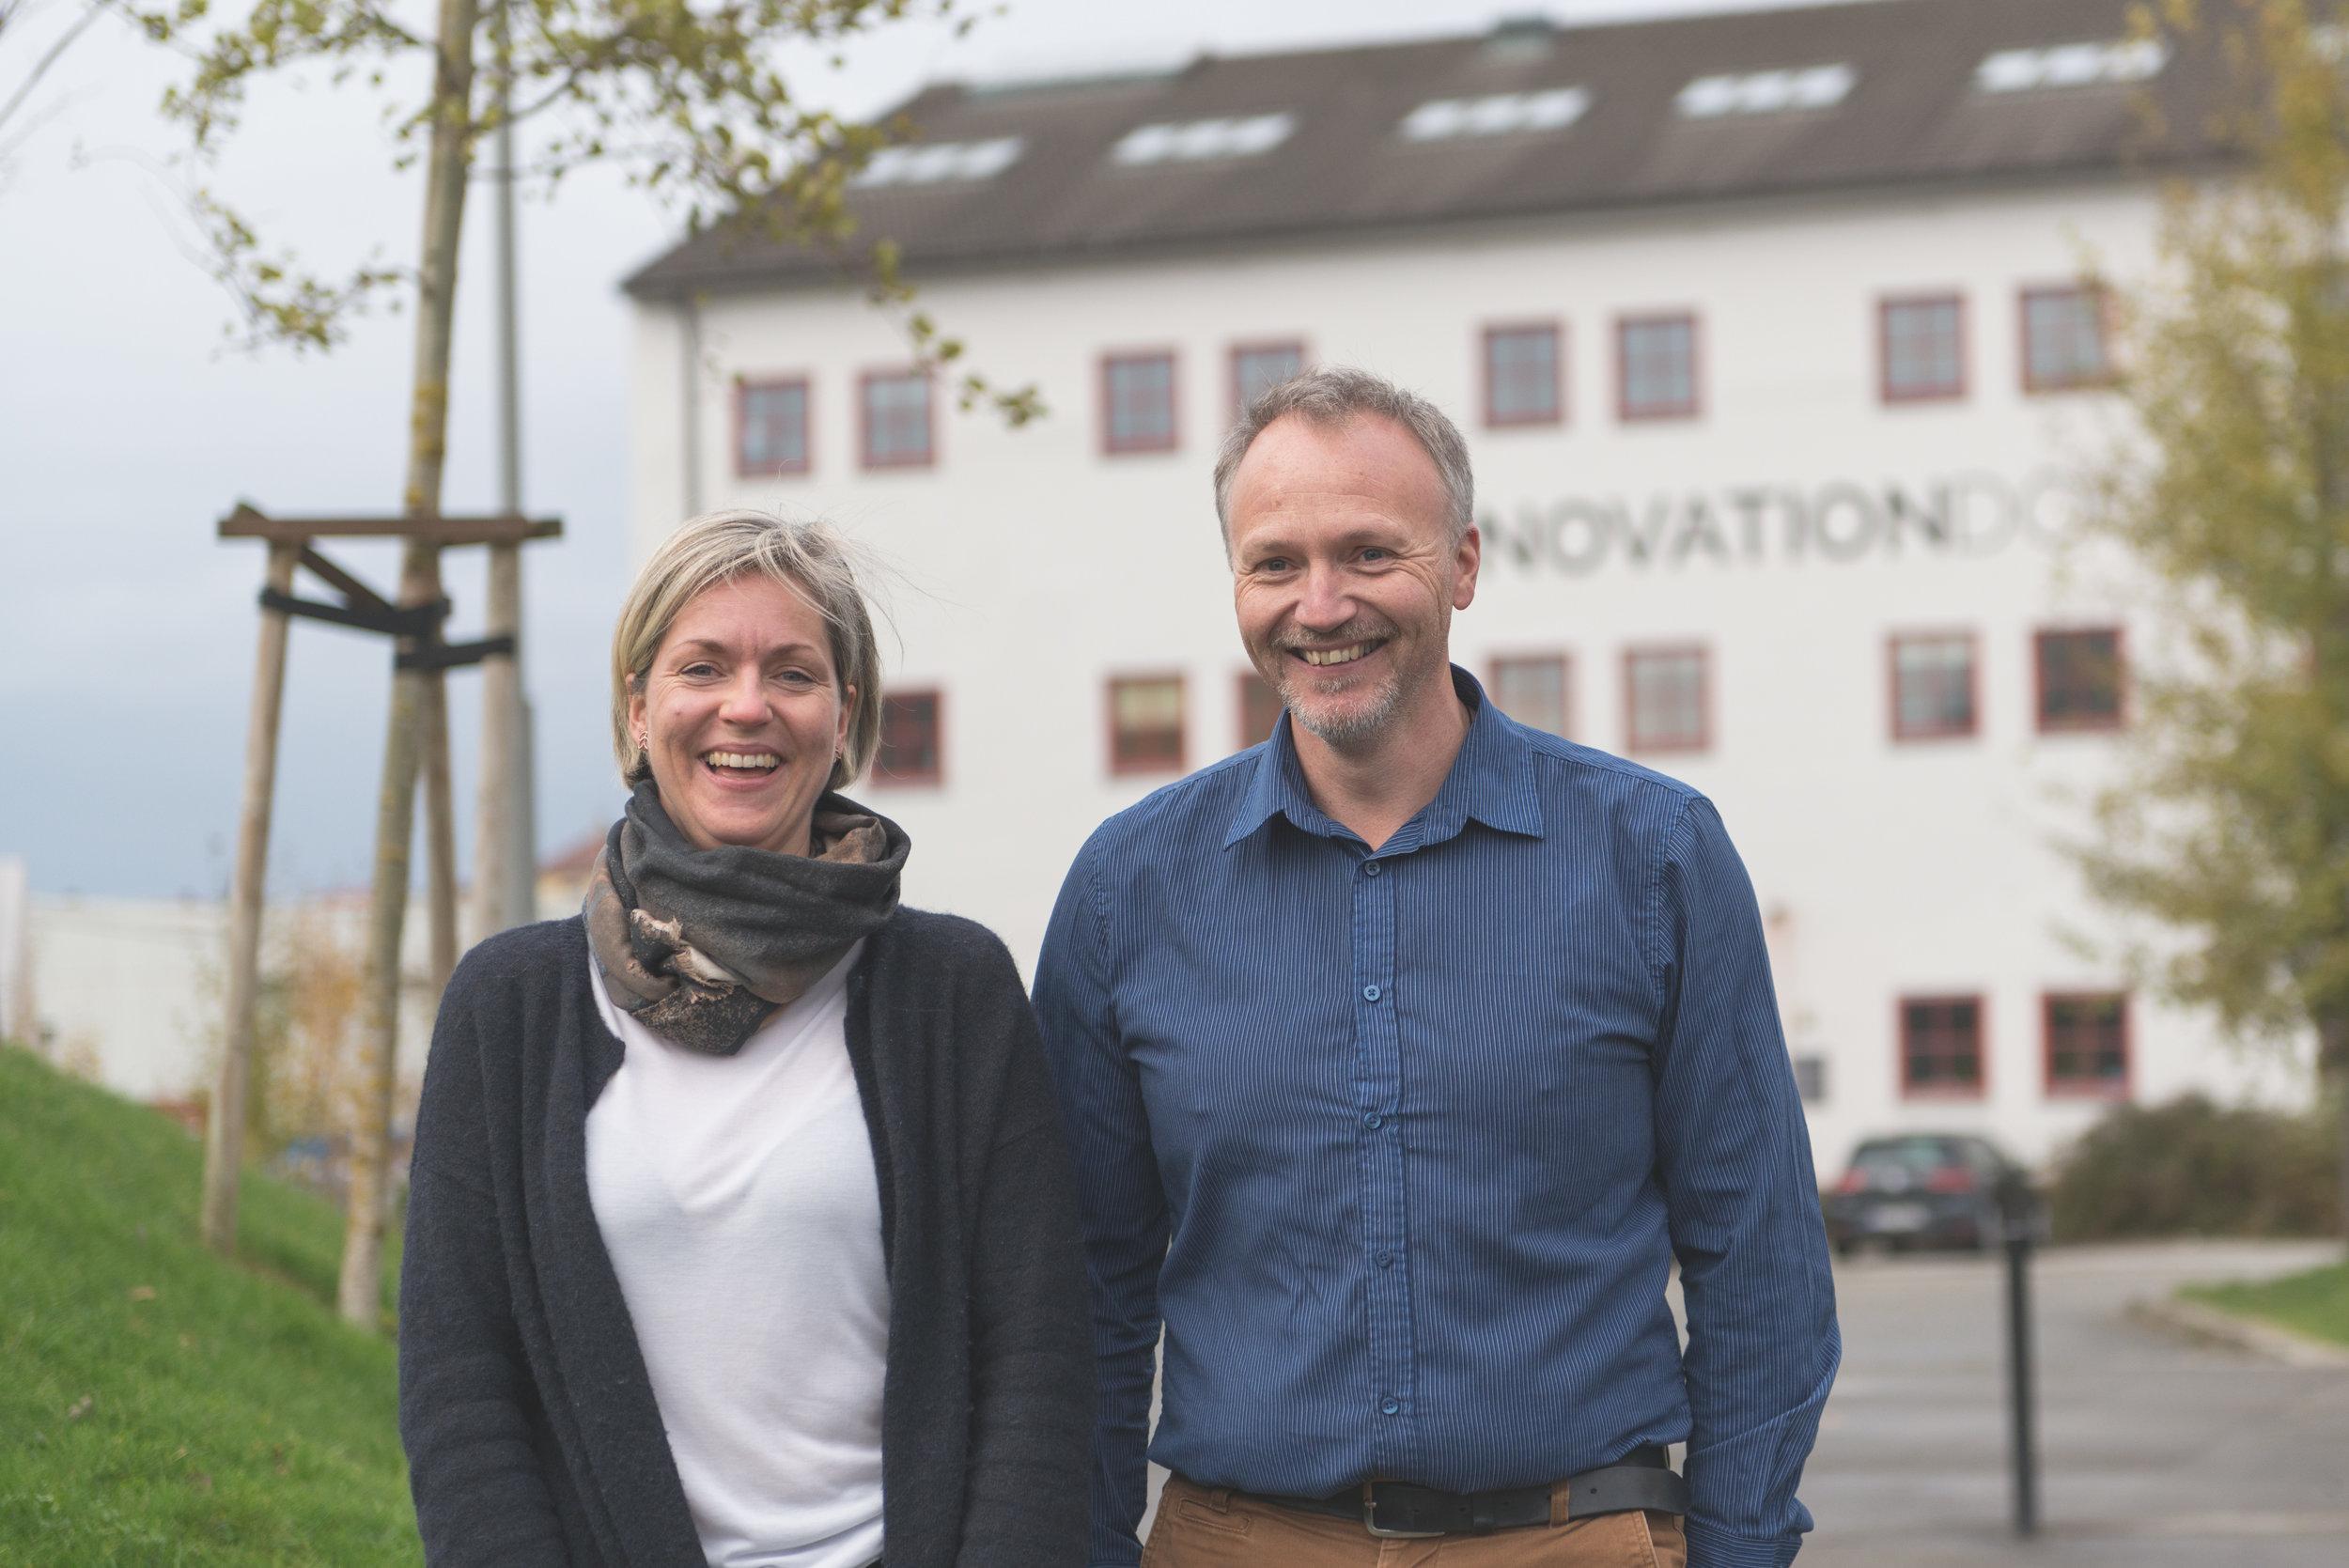 Maria Aasbø og Jan Erik Jacobsen. Foto: Alexander Chesham / Studio Stavanger